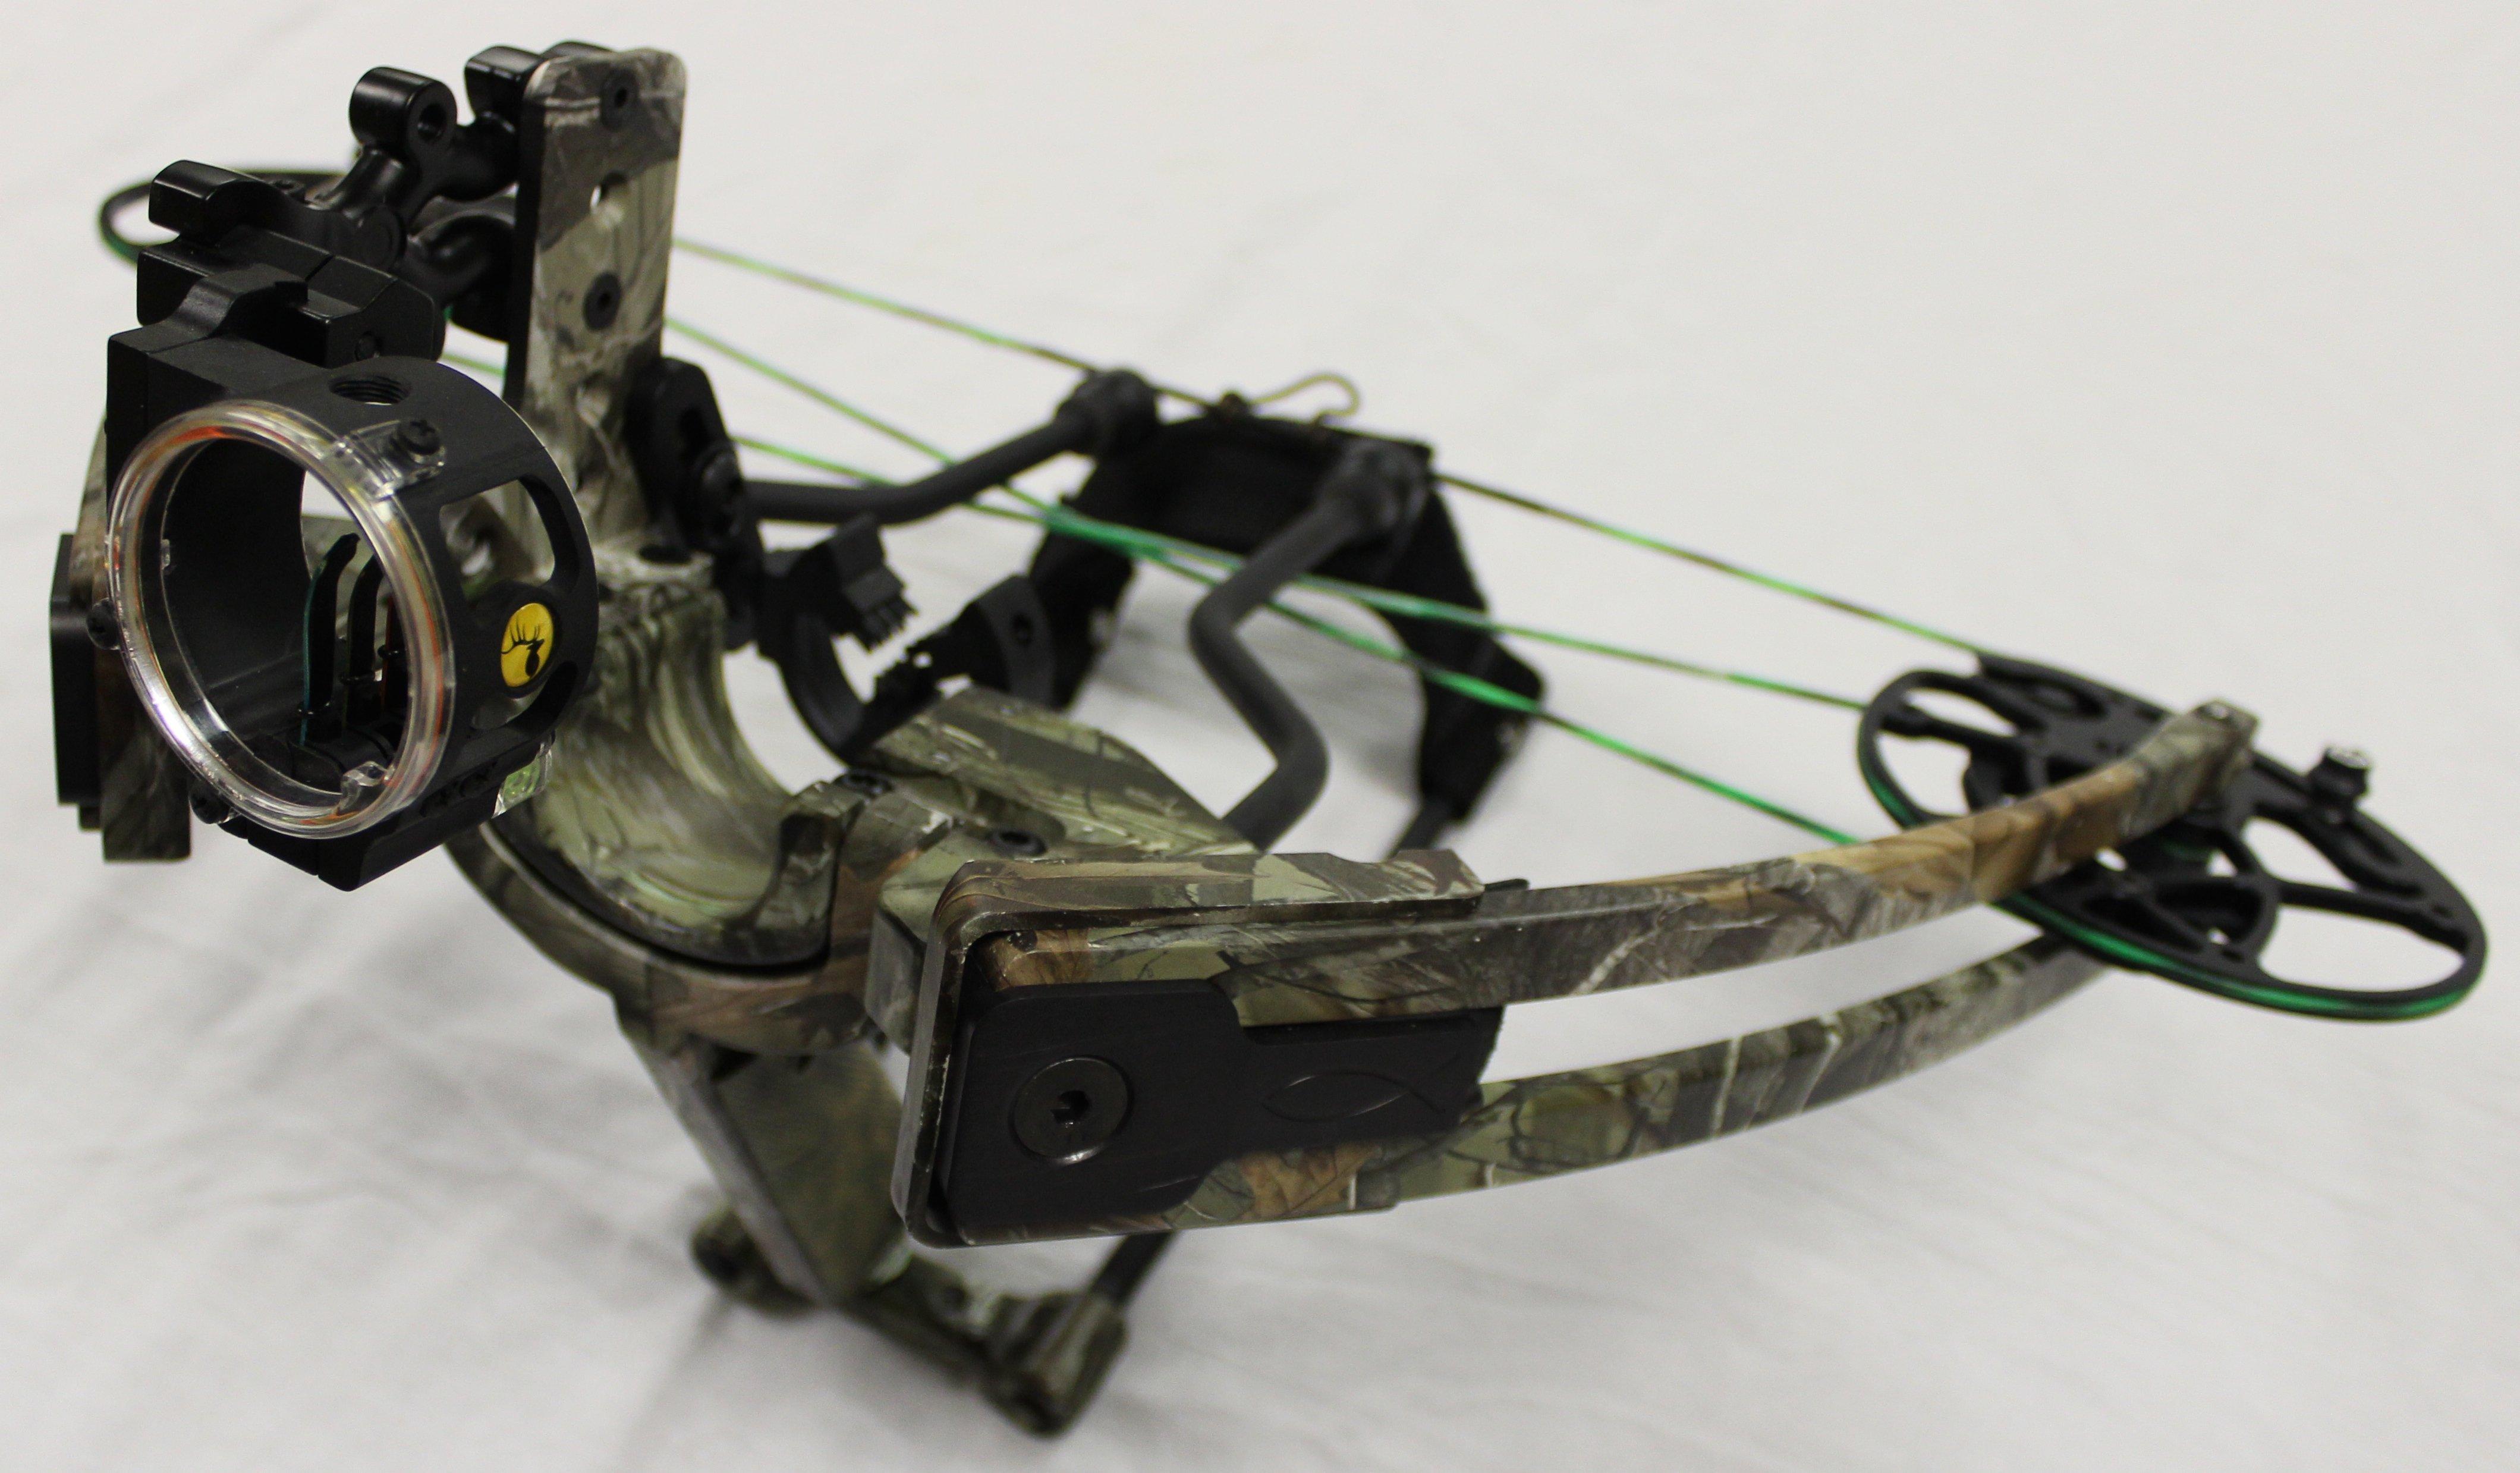 653 Next G2  - Hunting Bow